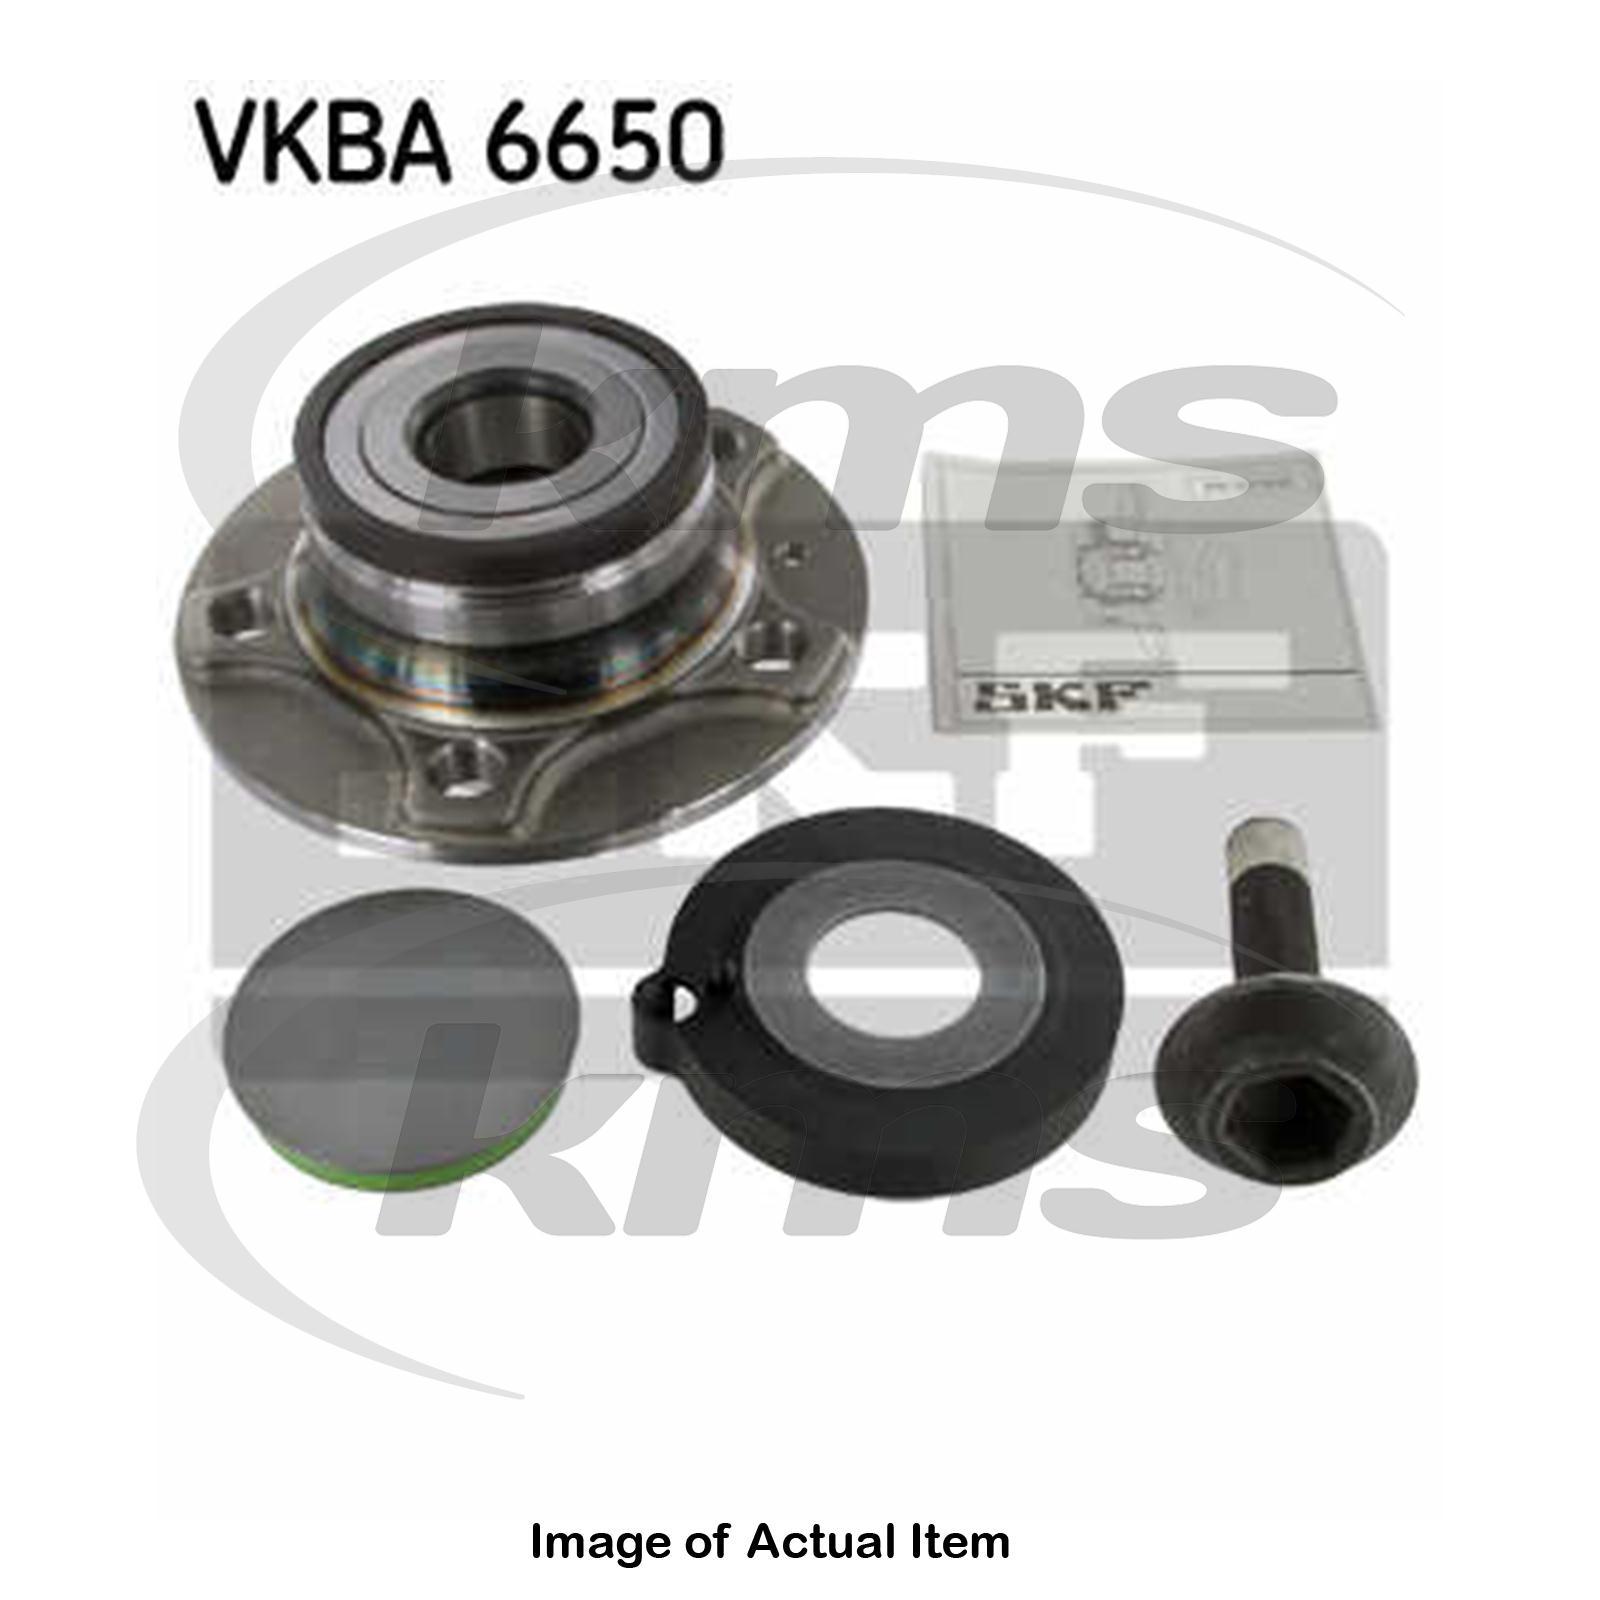 Volkswagen Tiguan 5 Doors 2016 Black Rear ClimAir 4559 Window Visors Master Dark